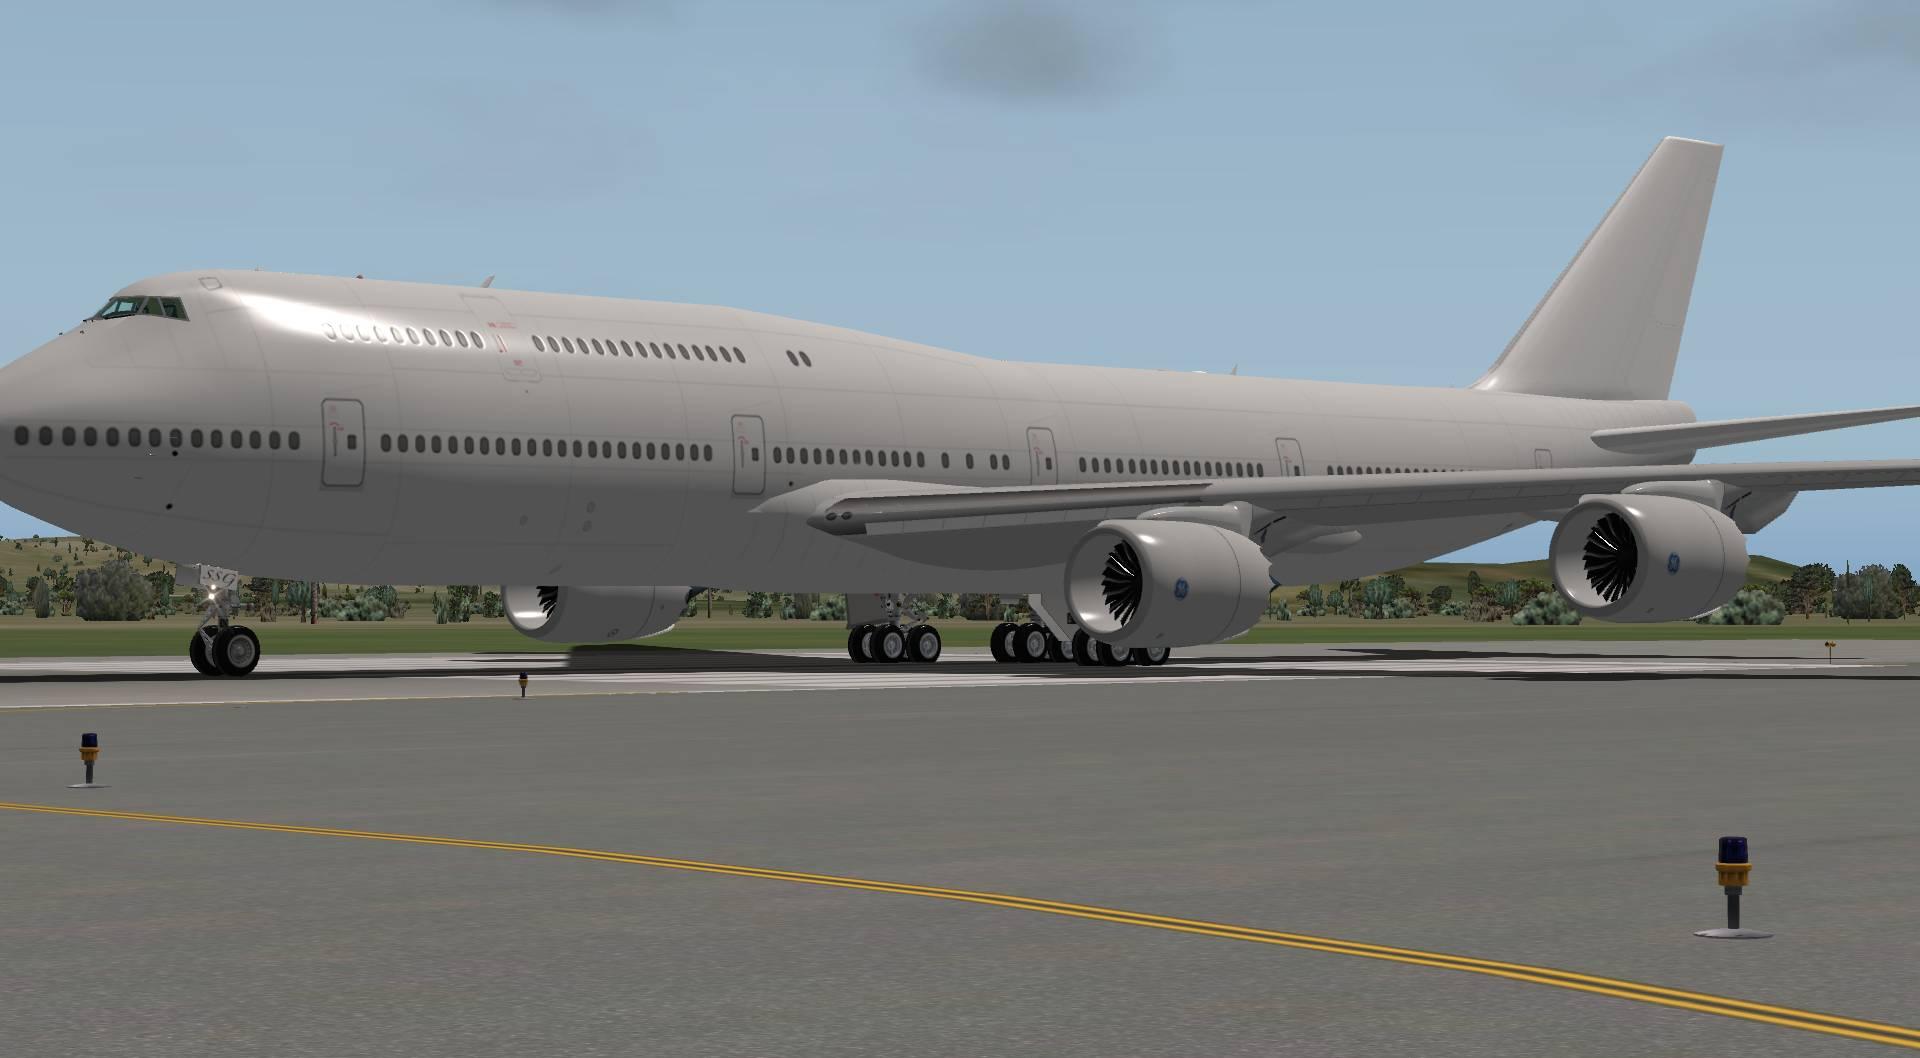 SSG 747-8 Series (Version 2 0) Paint Kit - Aircraft Skins